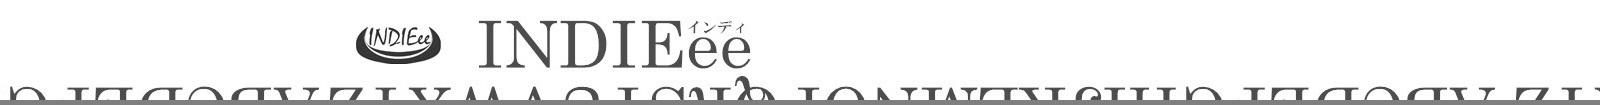 INDIEee:バッグ革製品の販売